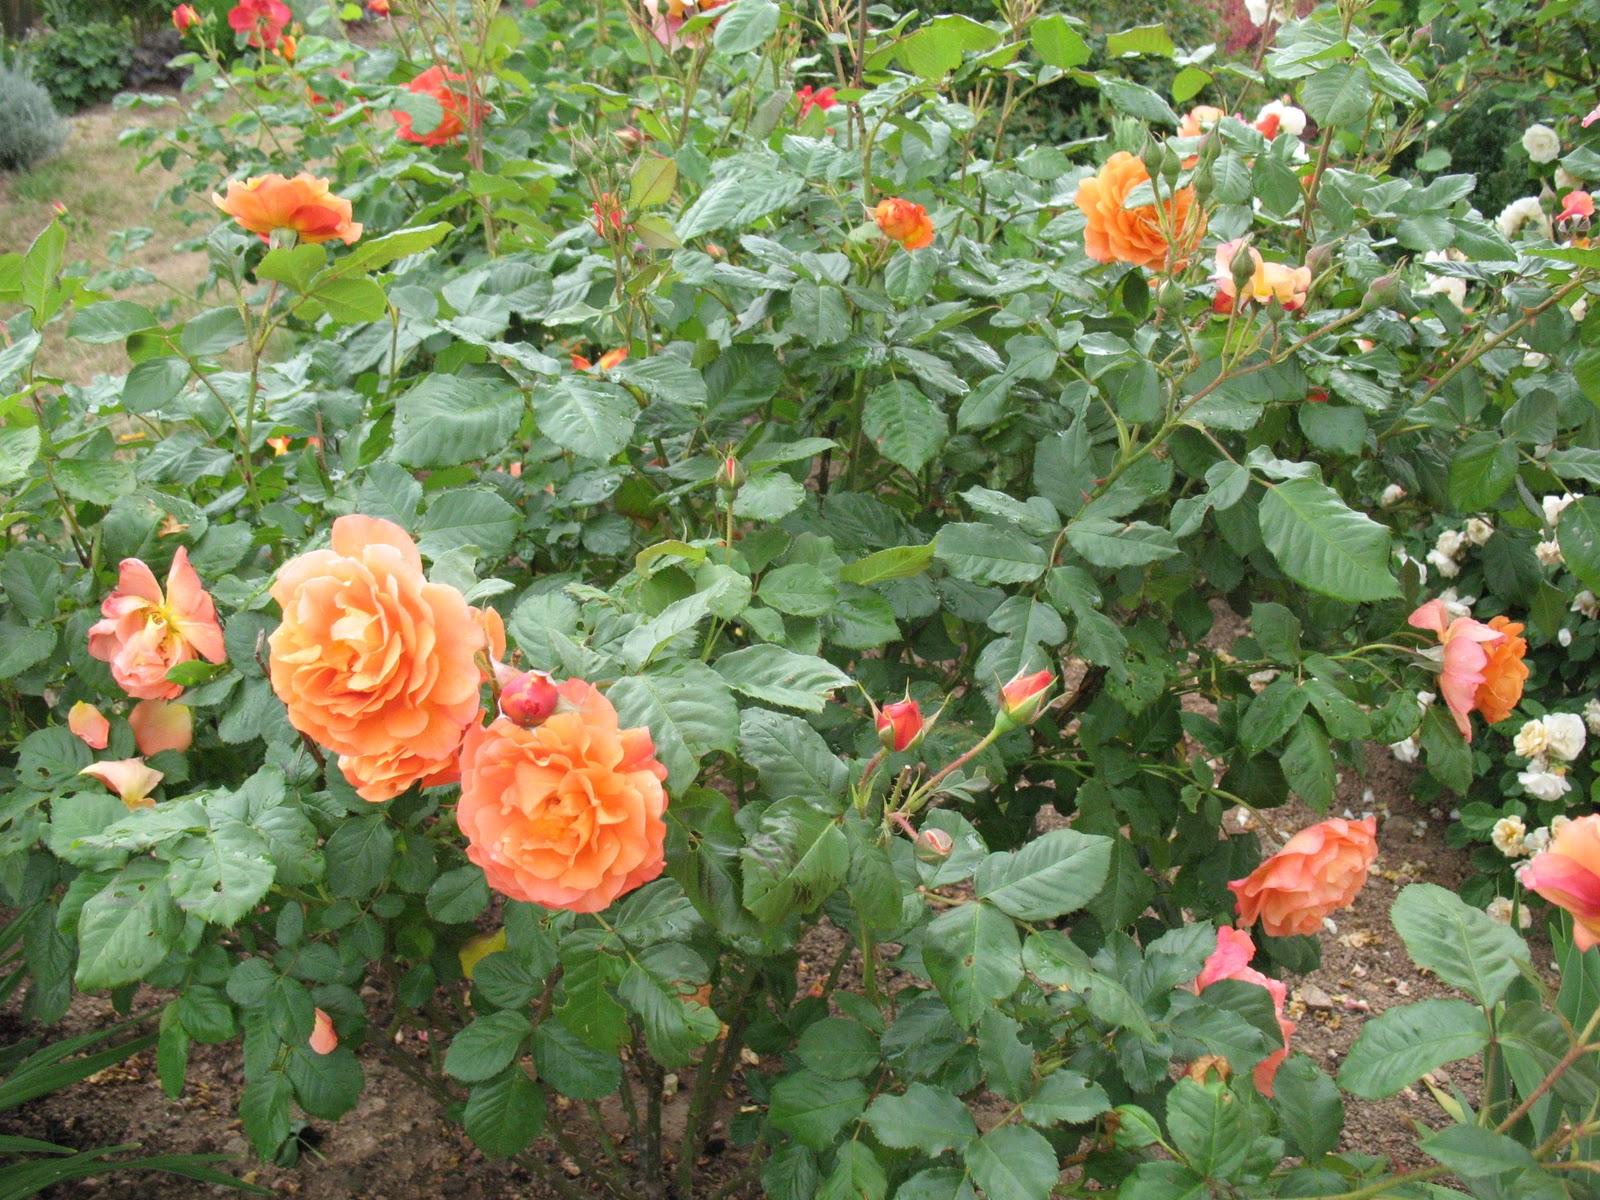 Roses du jardin ch neland rosier westerland - A quel moment tailler les rosiers ...